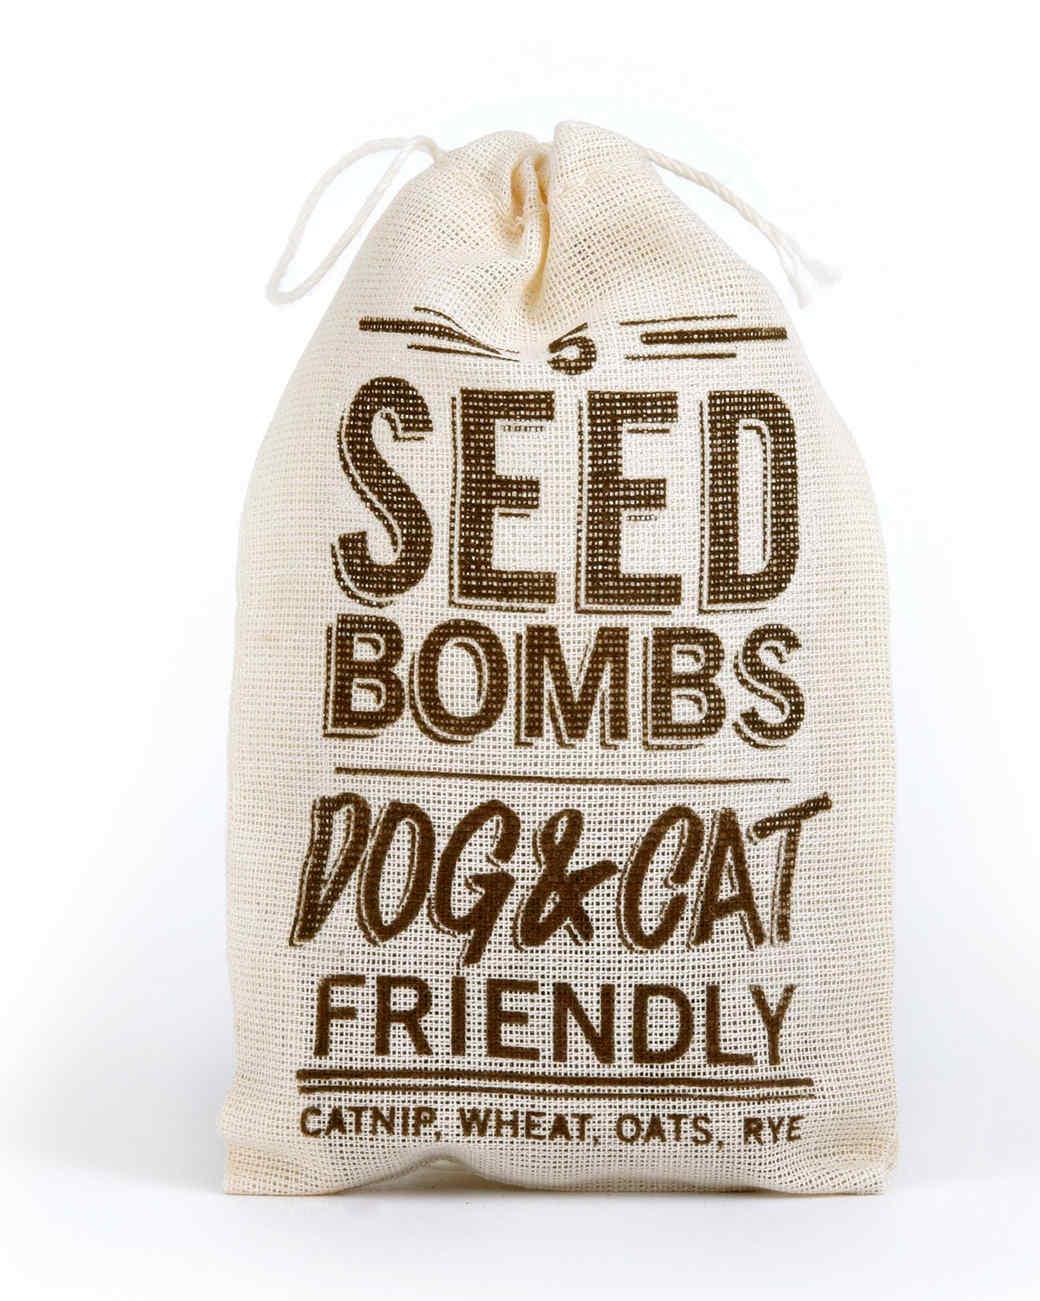 seed-bombs-0415.jpg